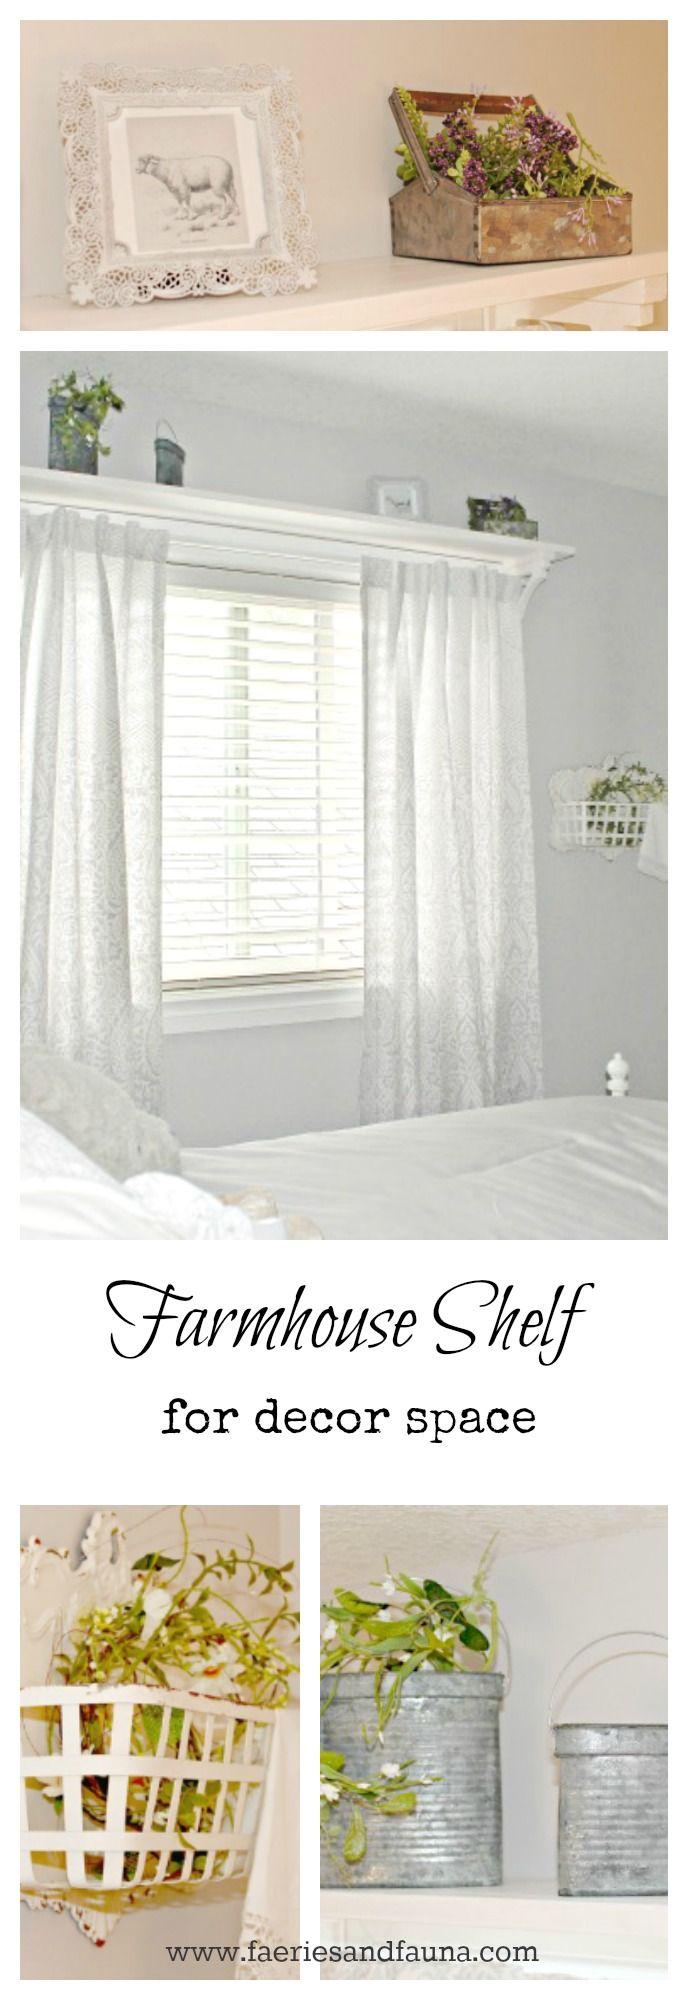 Decorating theme bedrooms maries manor window treatments curtains - Diy Farmhouse Shelf Farmhouse Furniturefarmhouse Decordiy